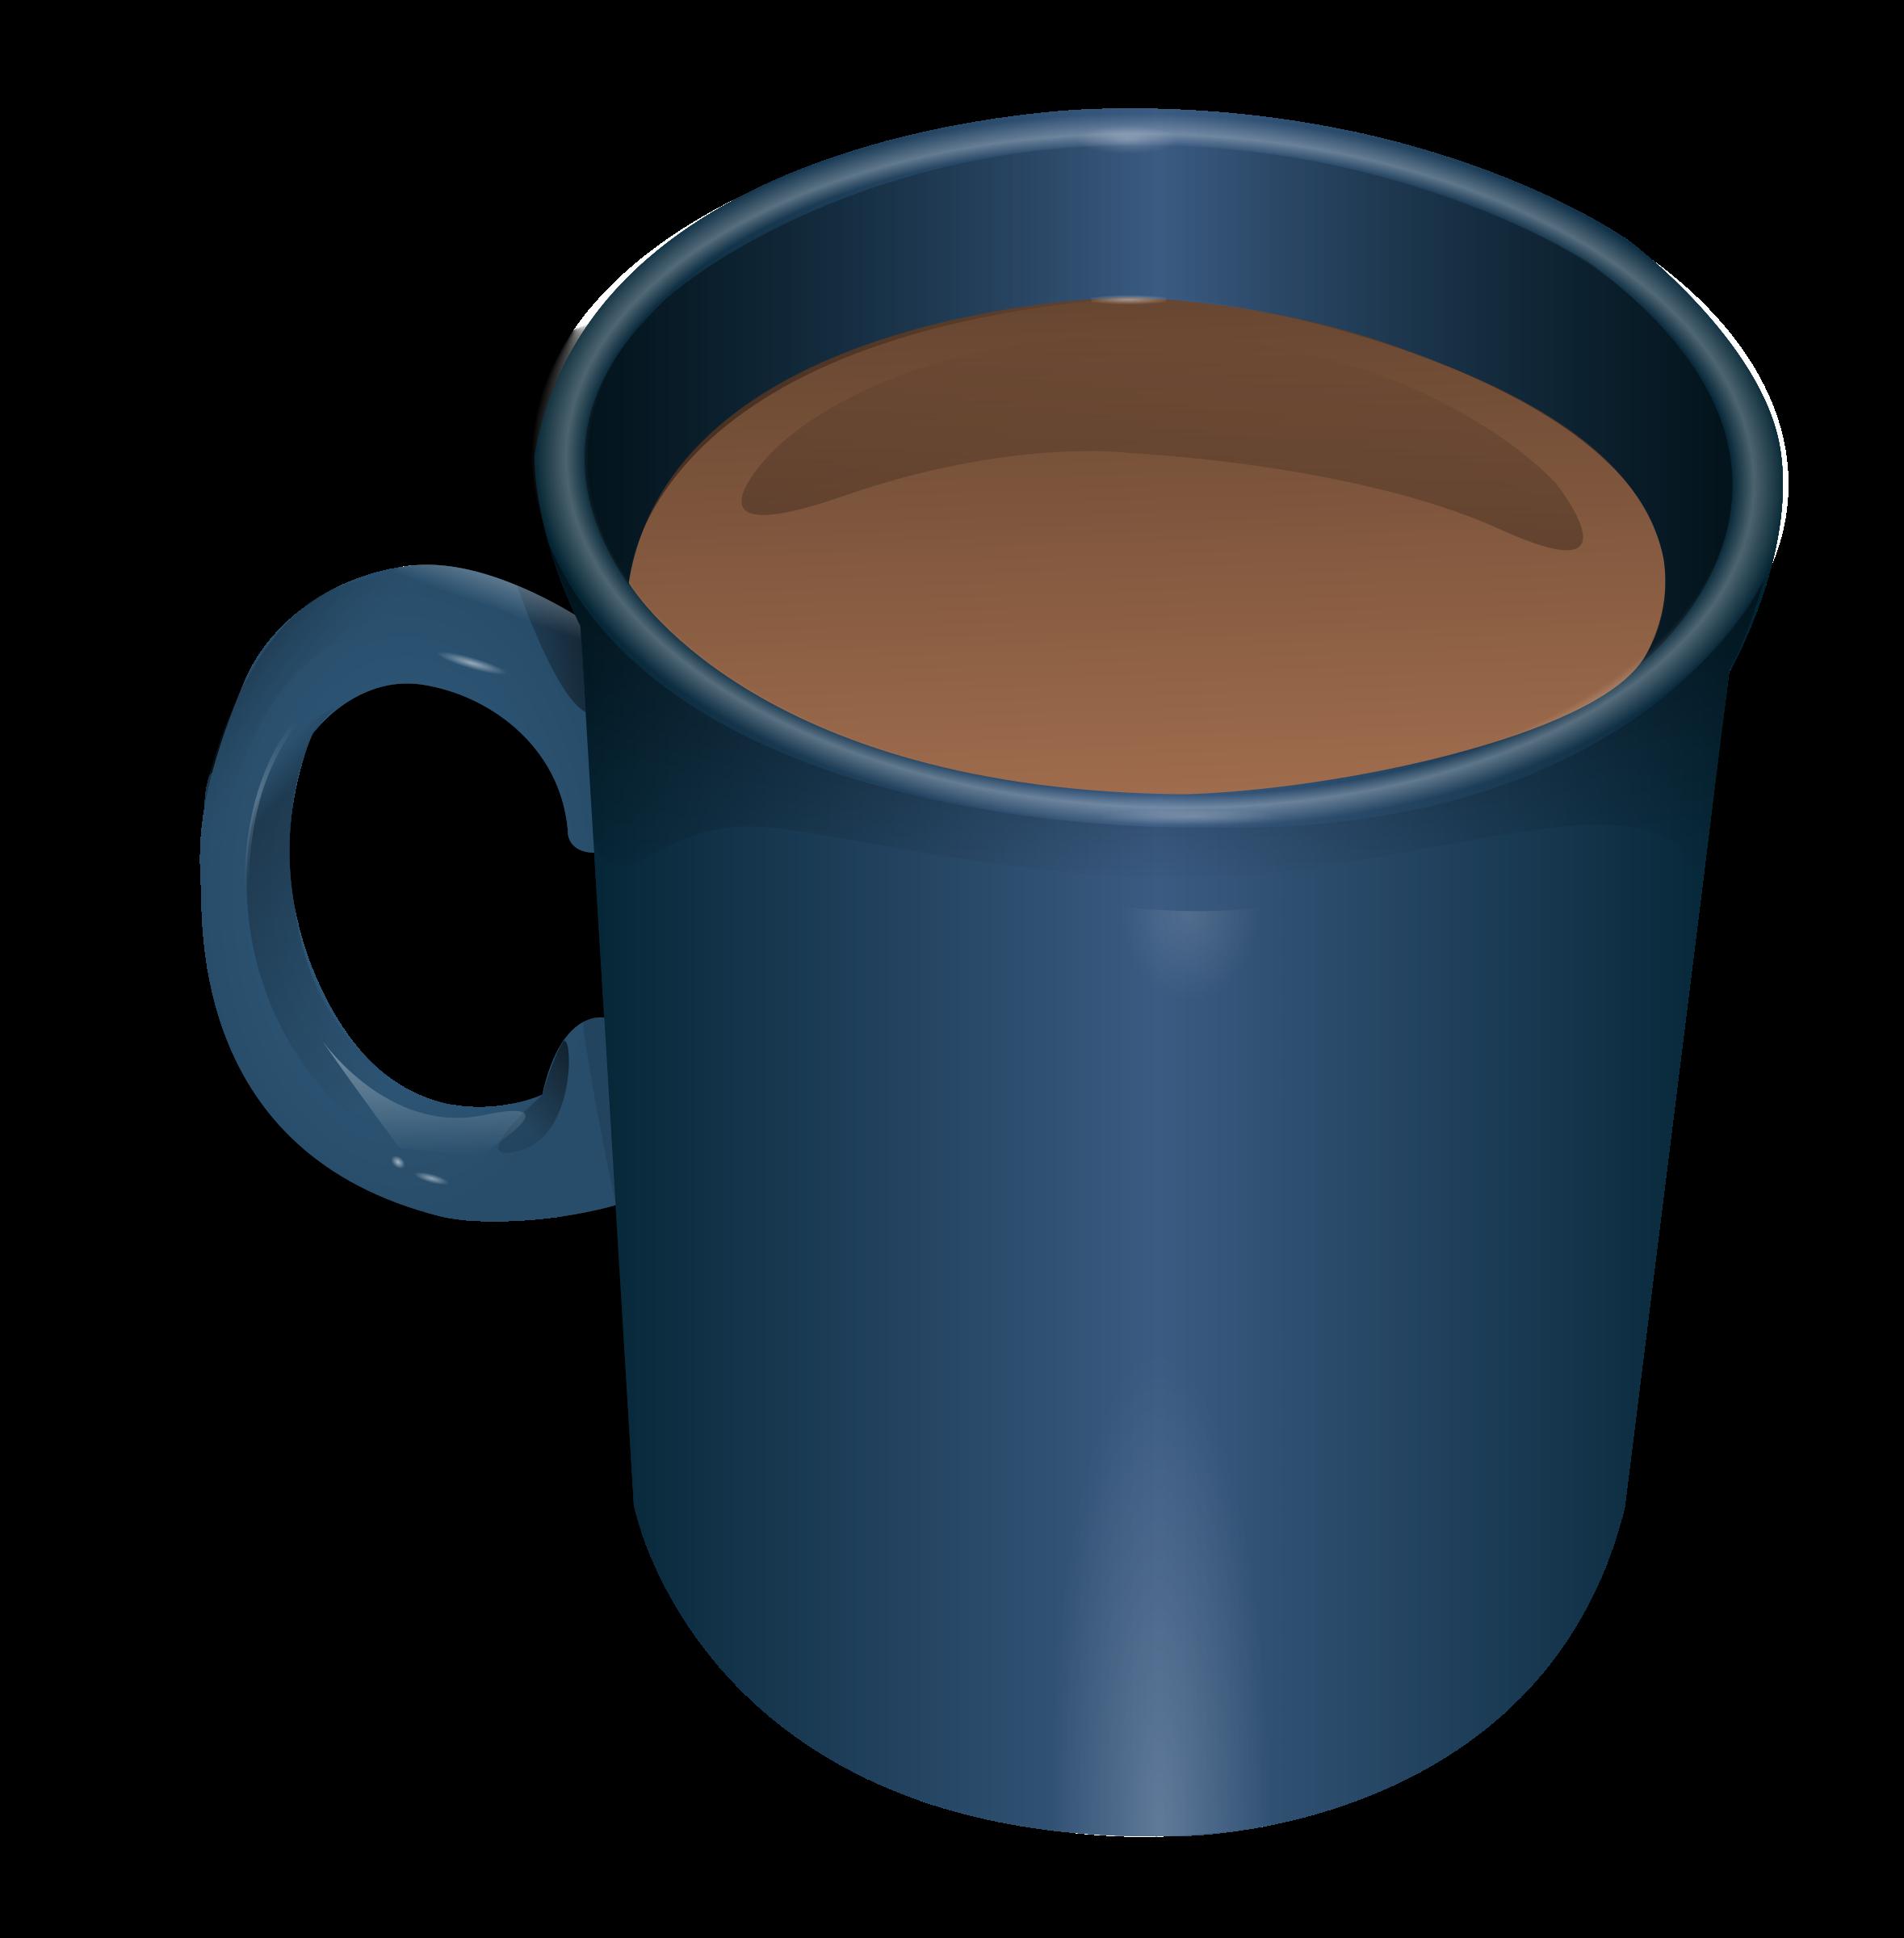 Clipart coffee coffee mug. Big image png